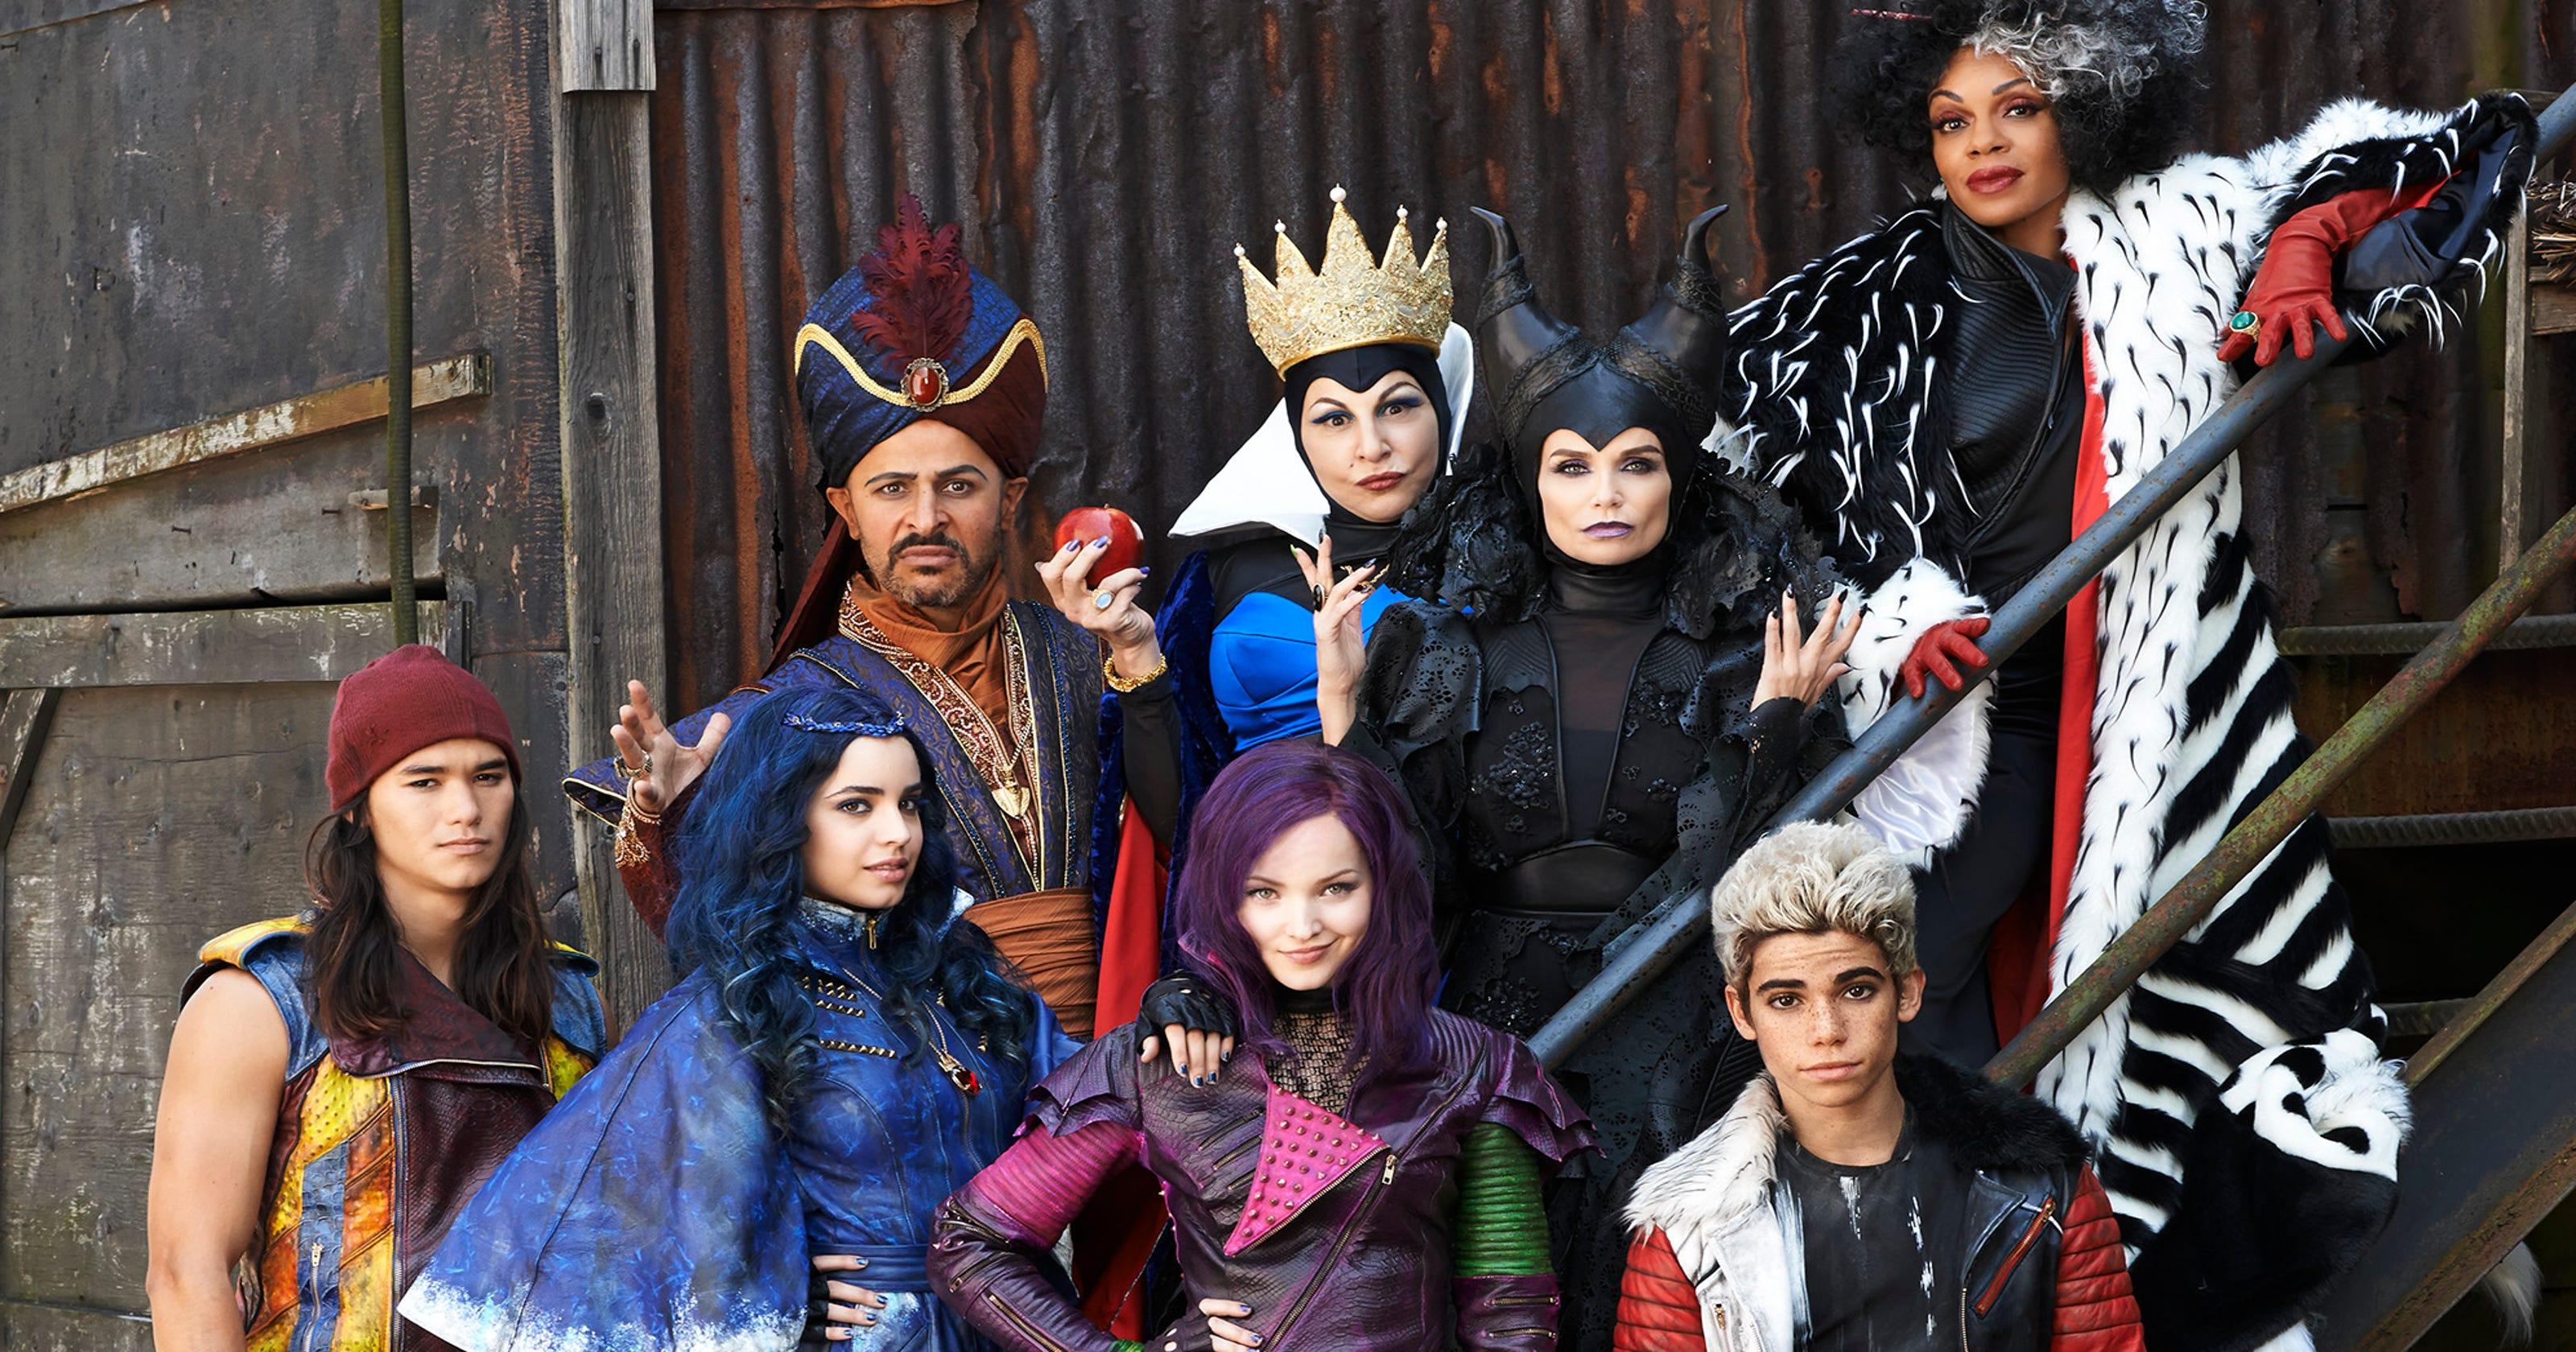 Descendants 3' is coming in 2019, Disney Channel announces